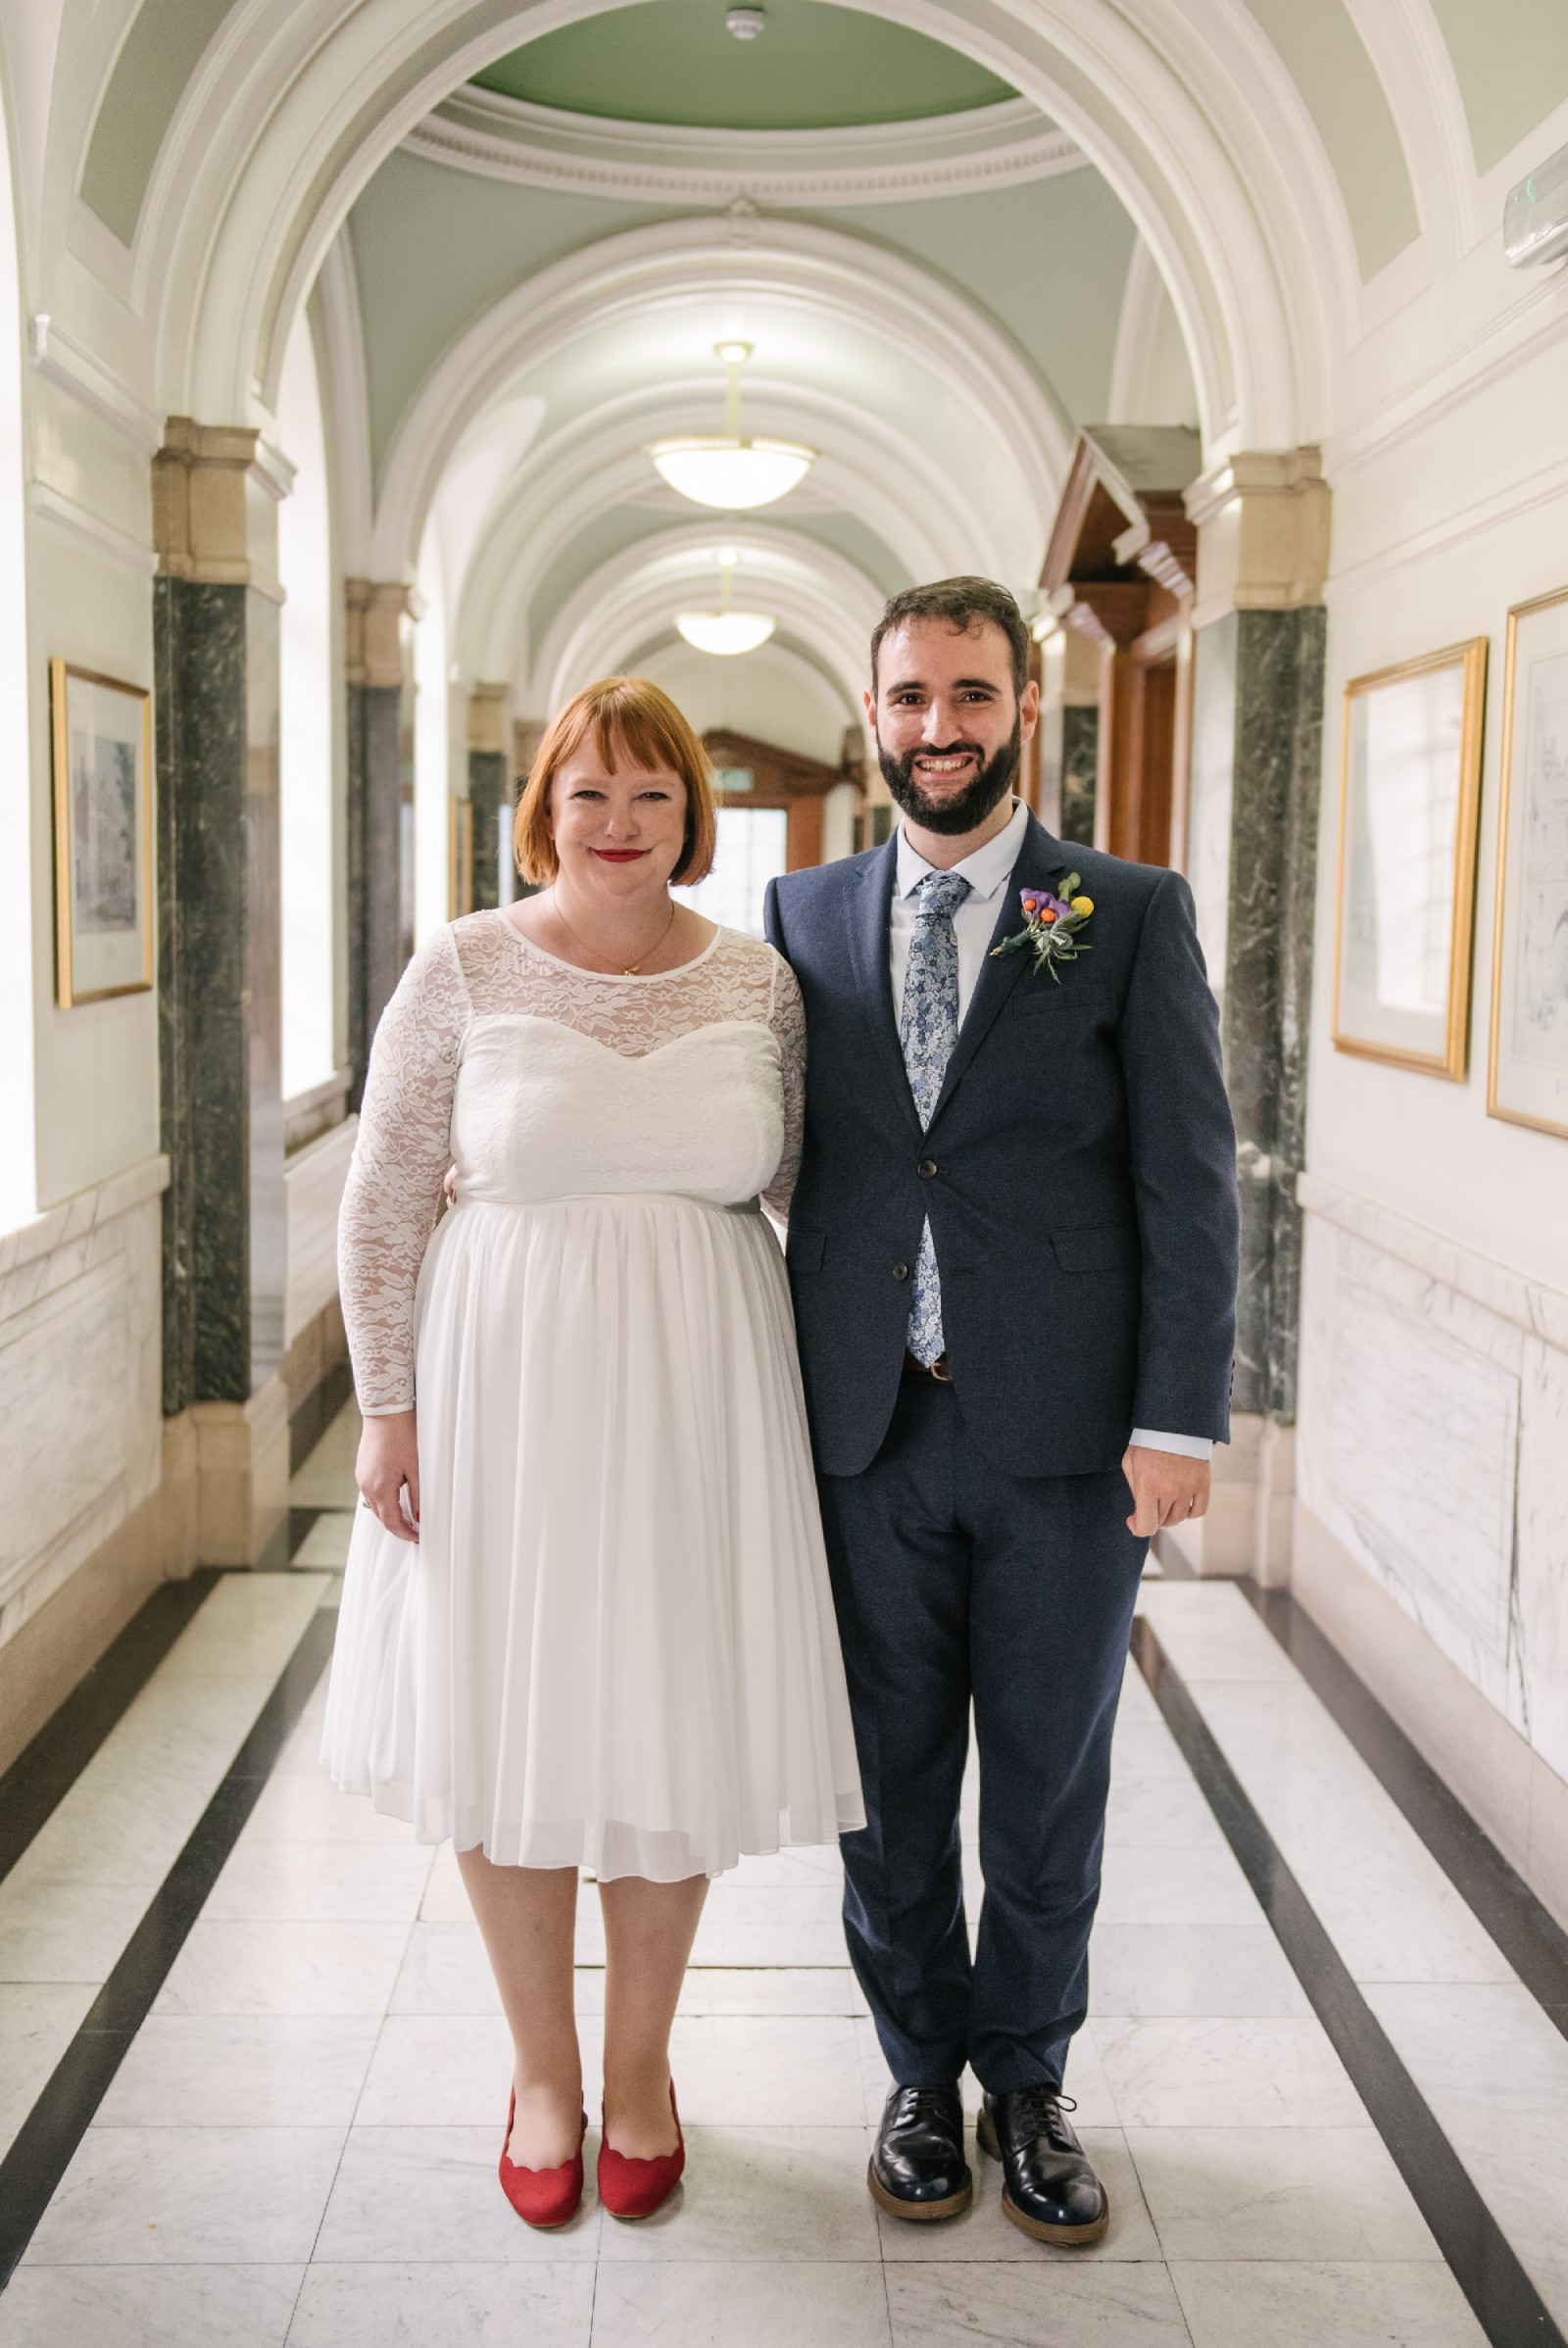 Scarlett & Jo Plus-size Ivory Bridal Lace Prom Dress Wedding Dress On Sale  - 60% Off